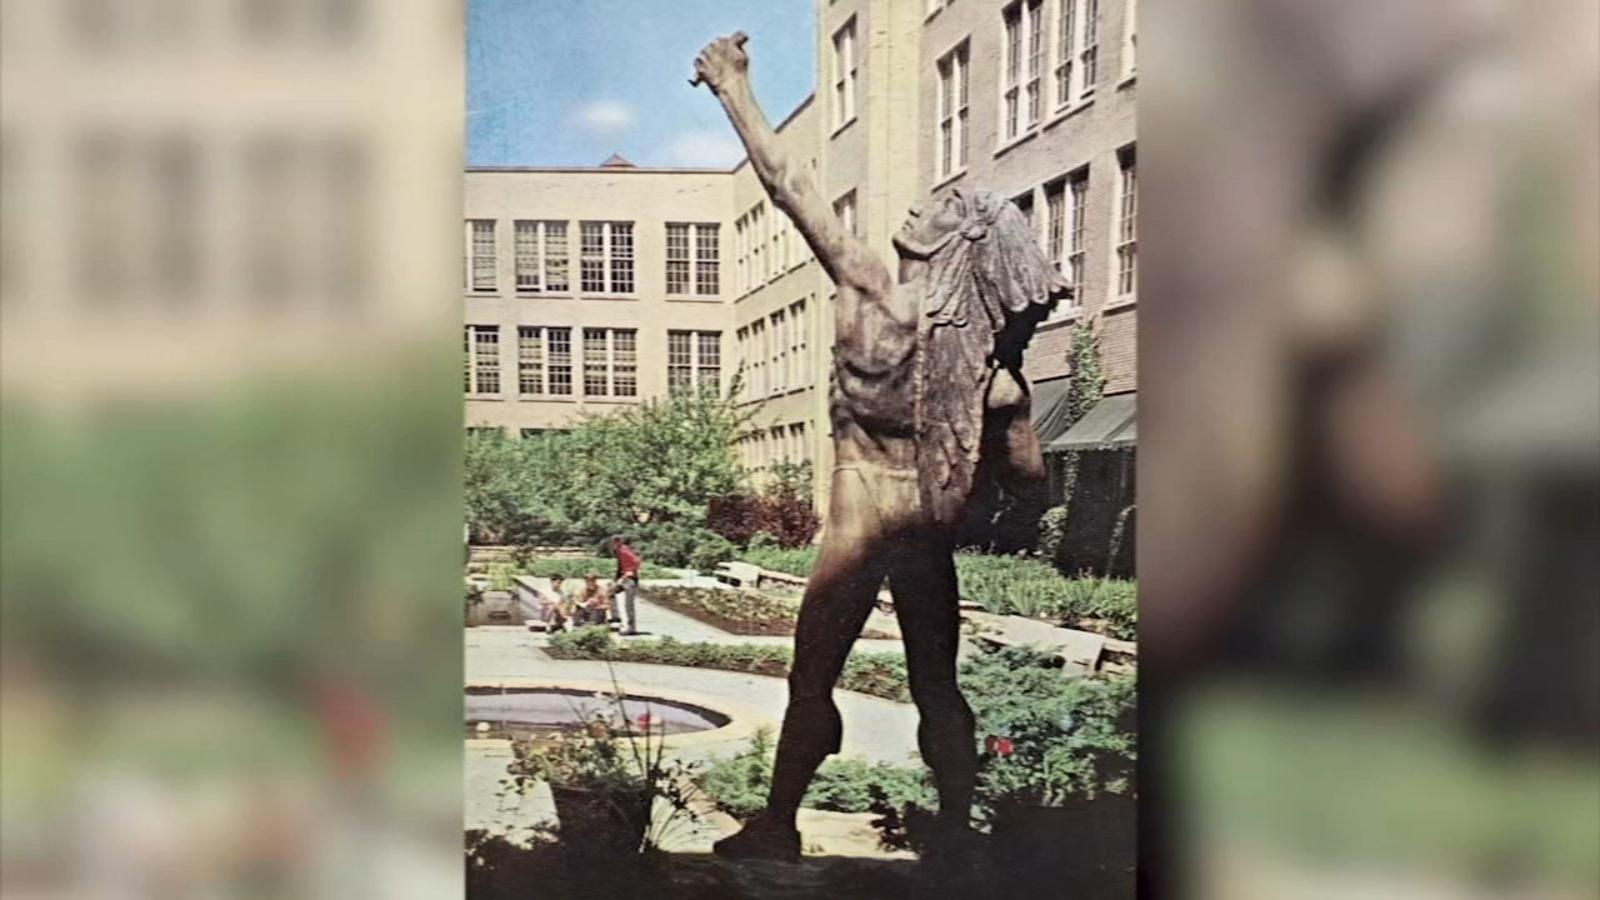 Lane Tech High School will scrap Indian mascot, council votes